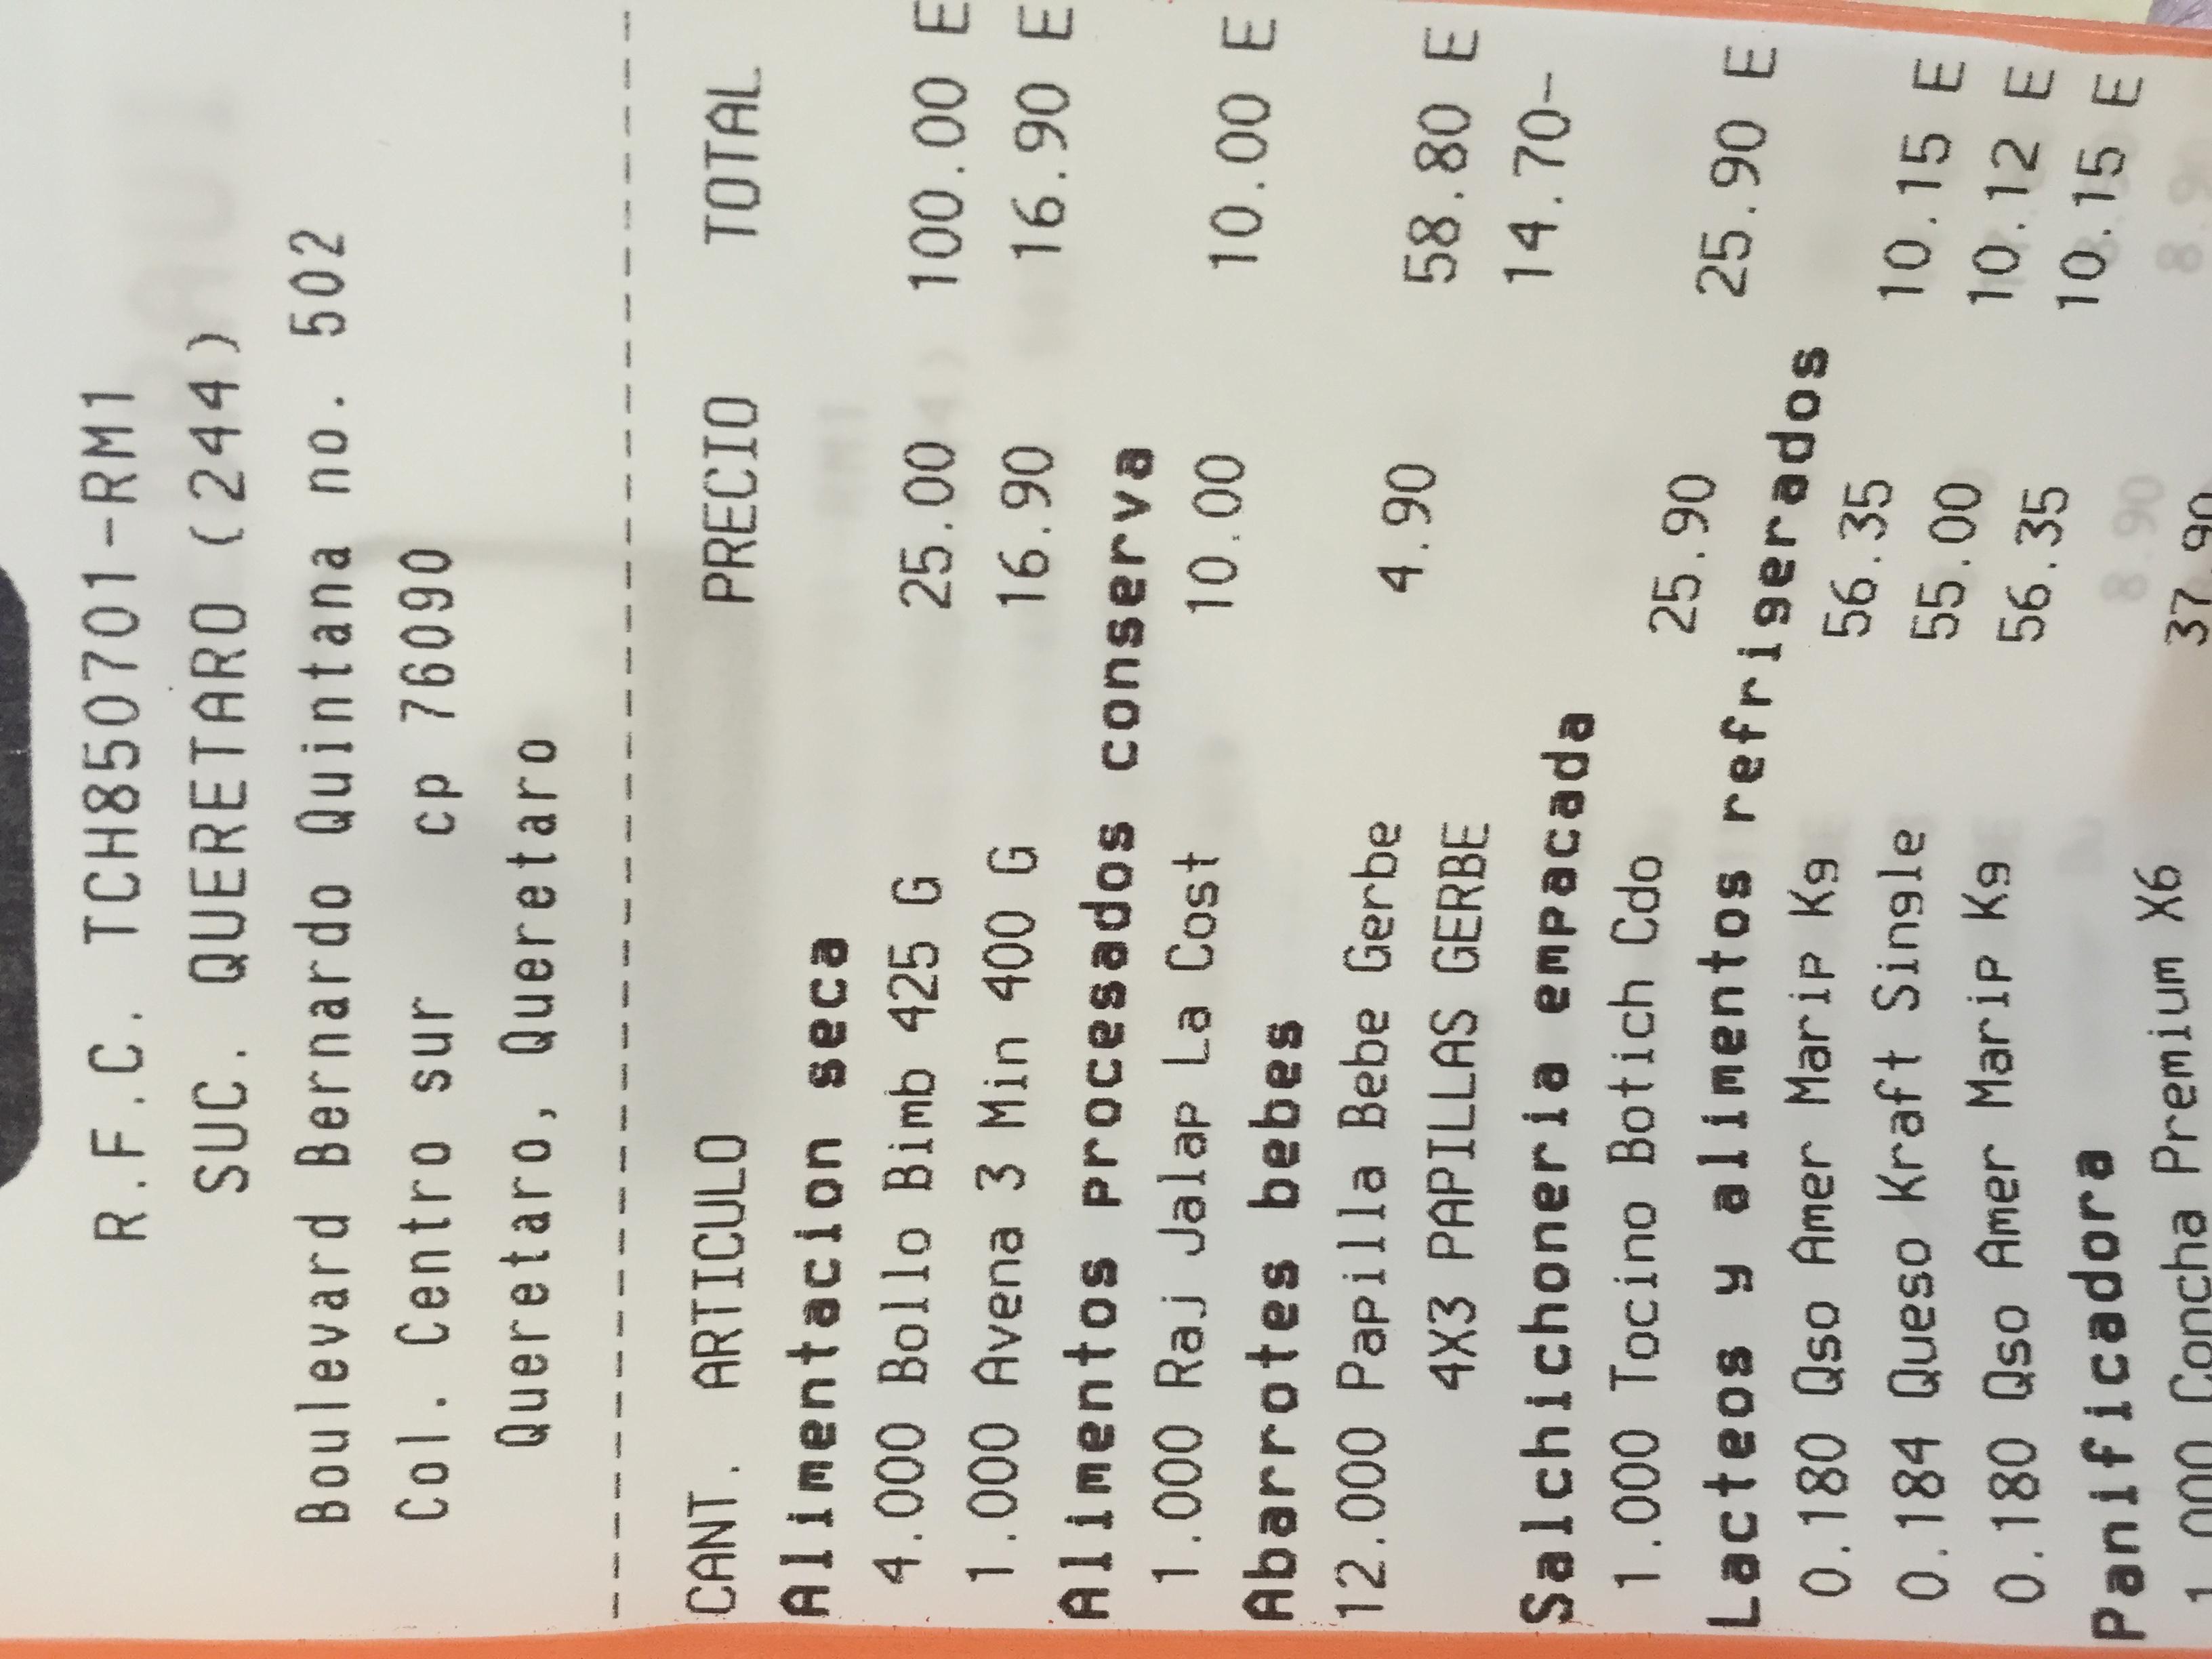 Chedraui: Yogolino Gerber de Manzana a $3.67 comprando 4 pzas.